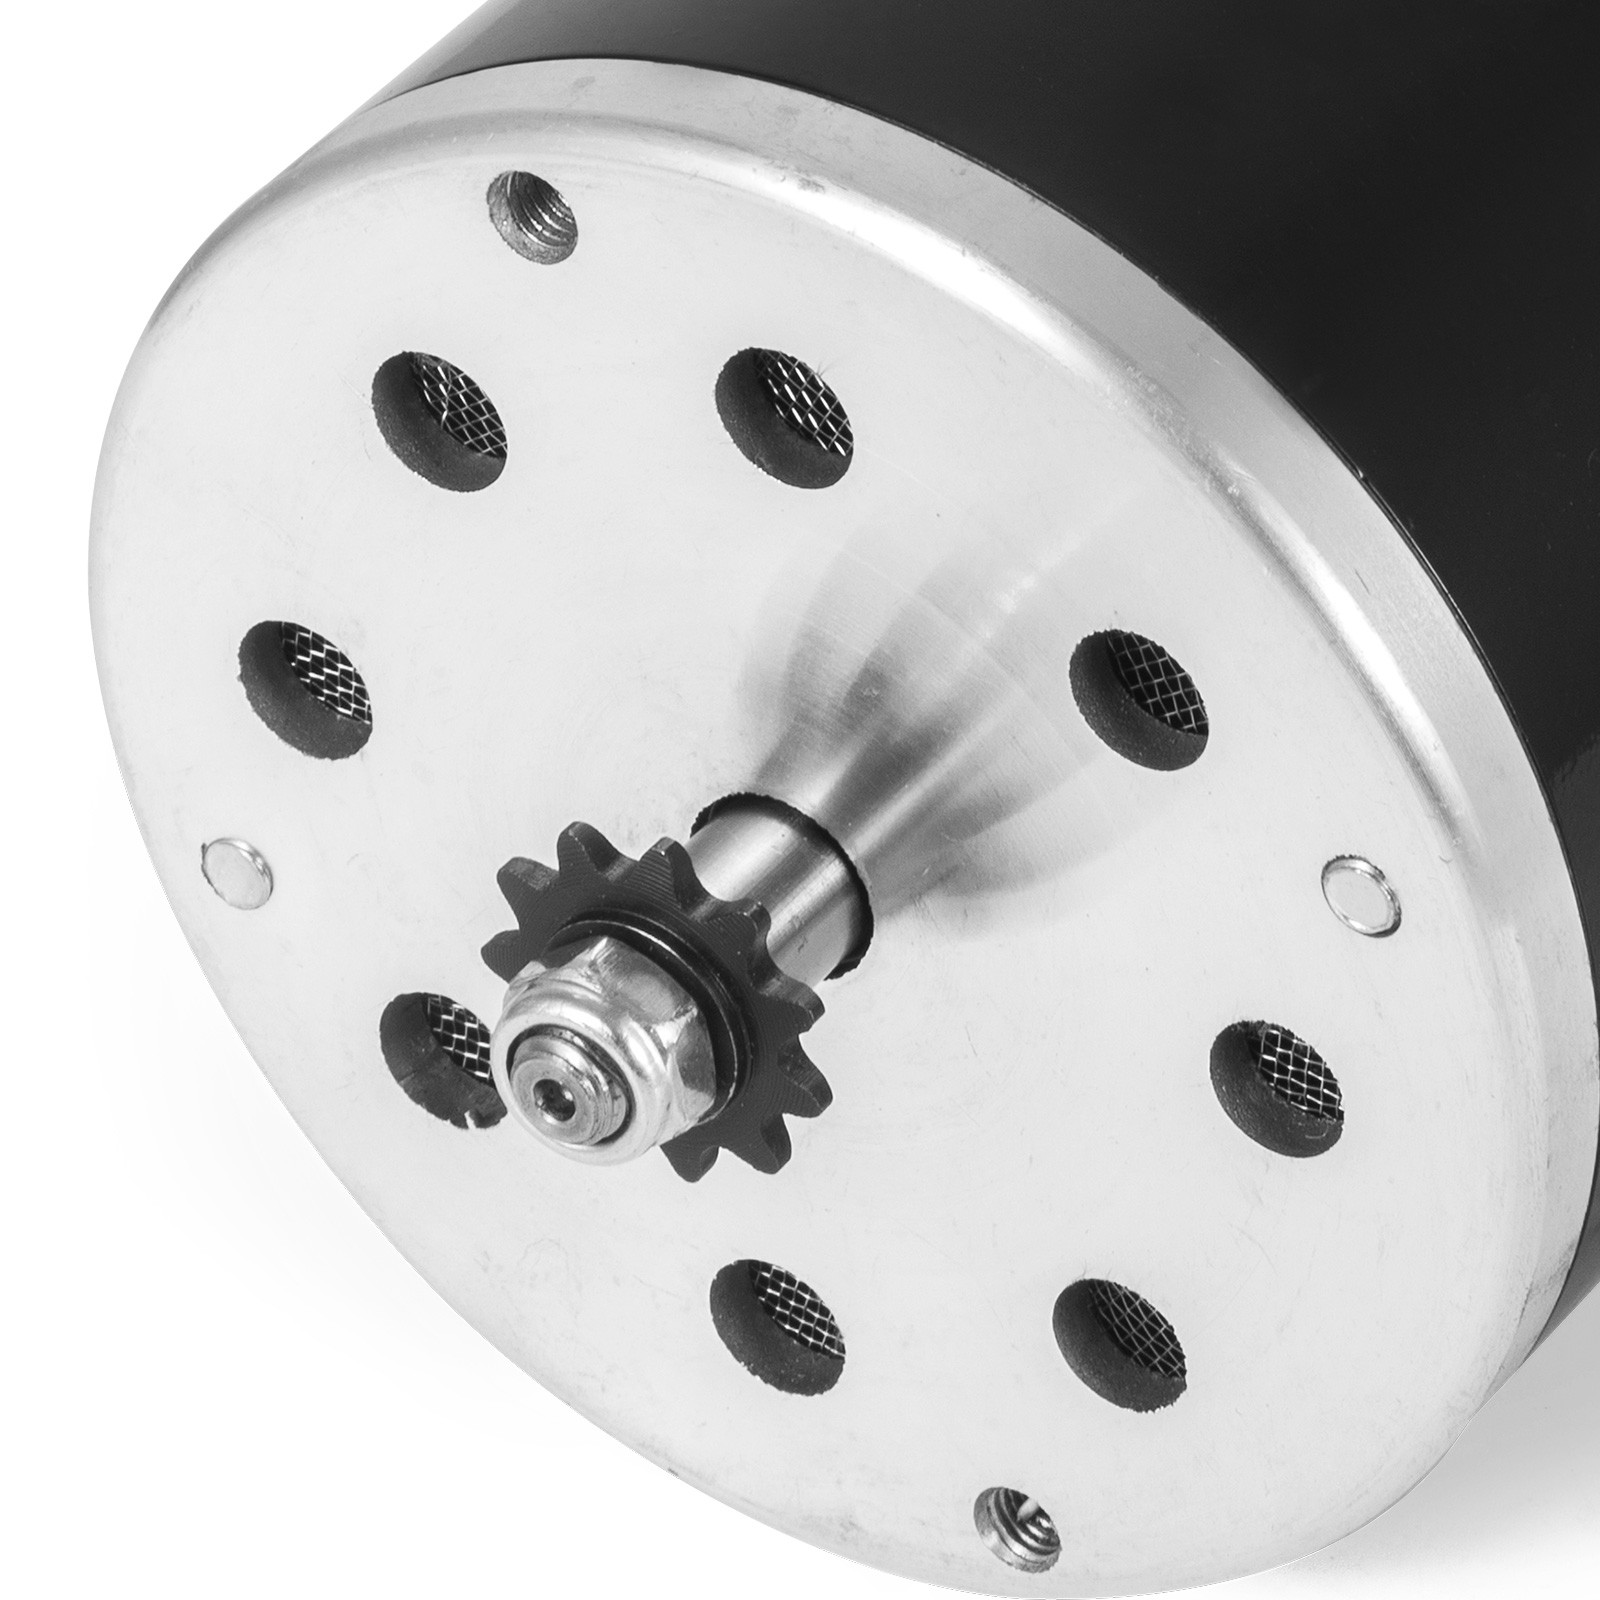 36v-Electric-Motor-controller-throttle-kit-f-Scooter-E-Scooter-ATV-Permanent thumbnail 103